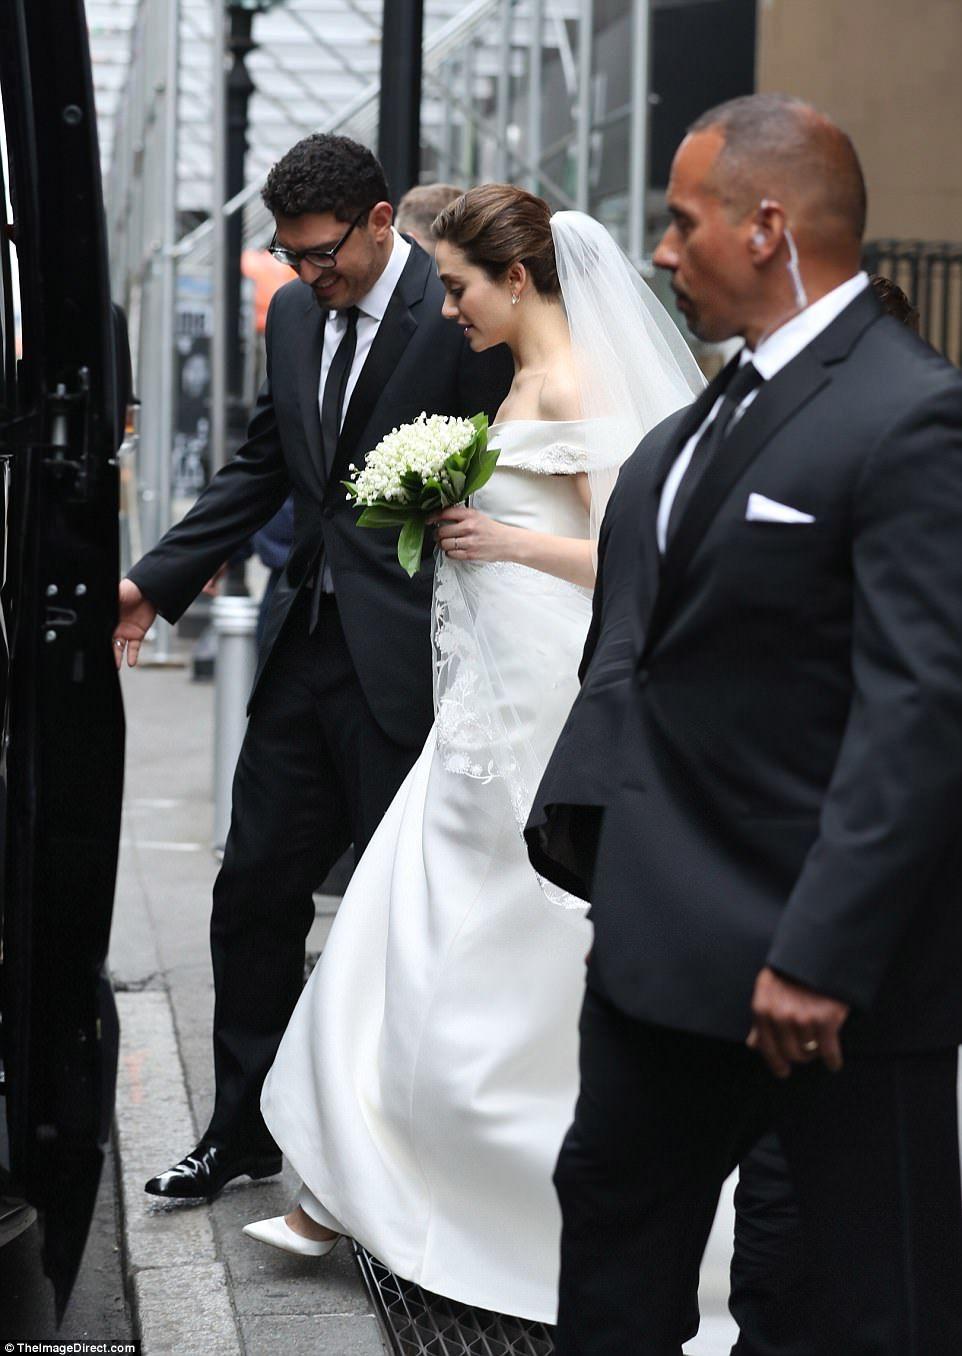 Emmy Rossum Wedding.Emmy Rossum Stuns In Carolina Herrera Gown As She Marries Sam Esmail